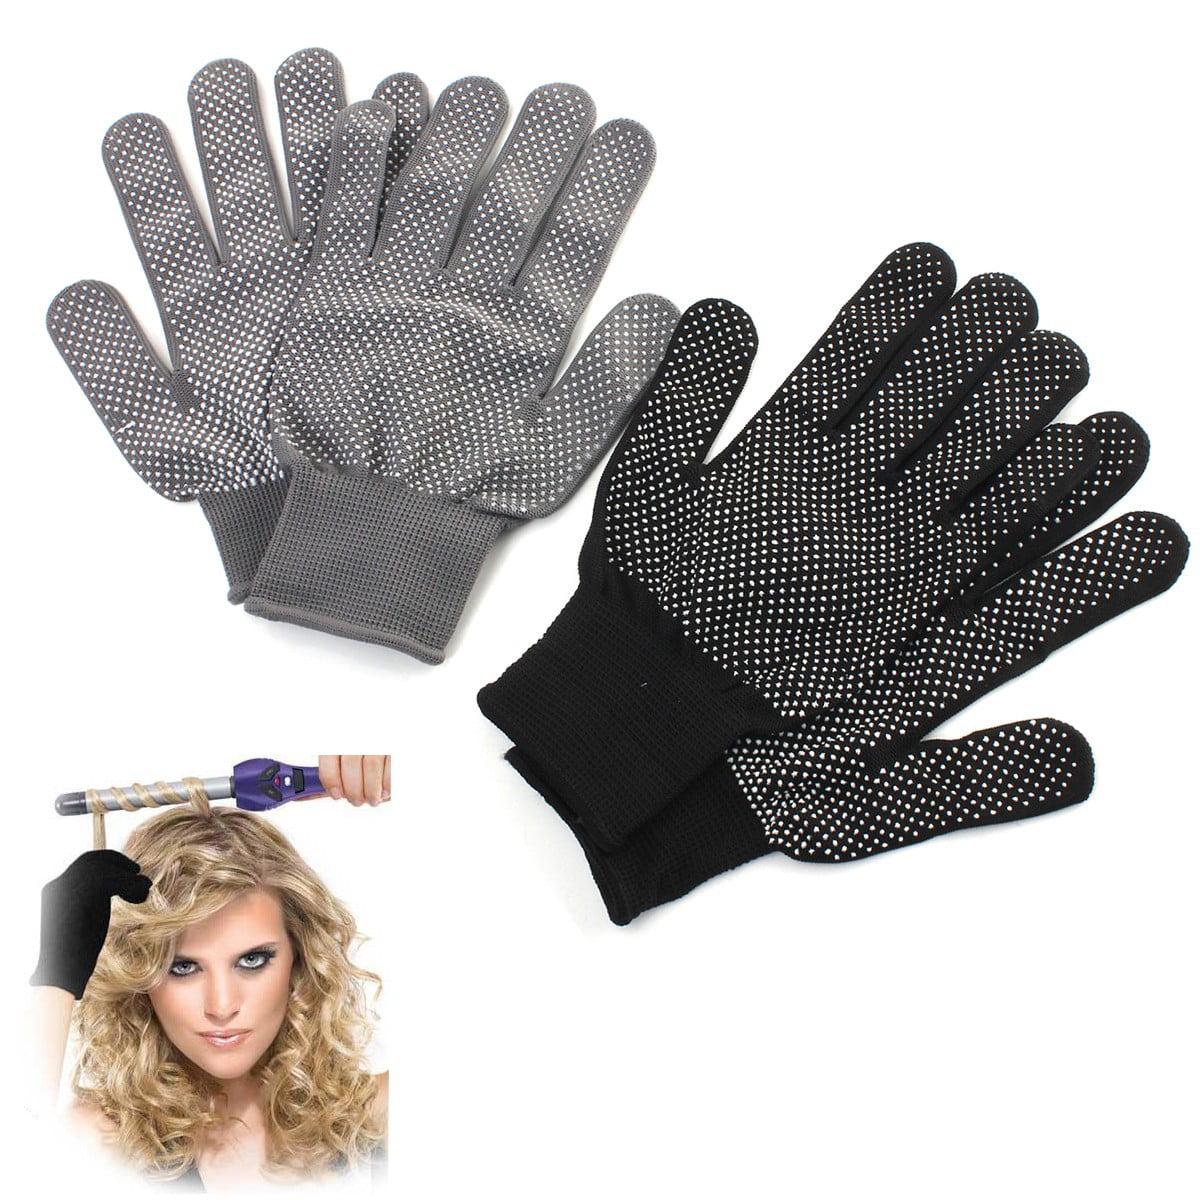 2Pcs Heat Resistant Curling Gloves for Hair Curler, Flat Iron, Hair Straightener